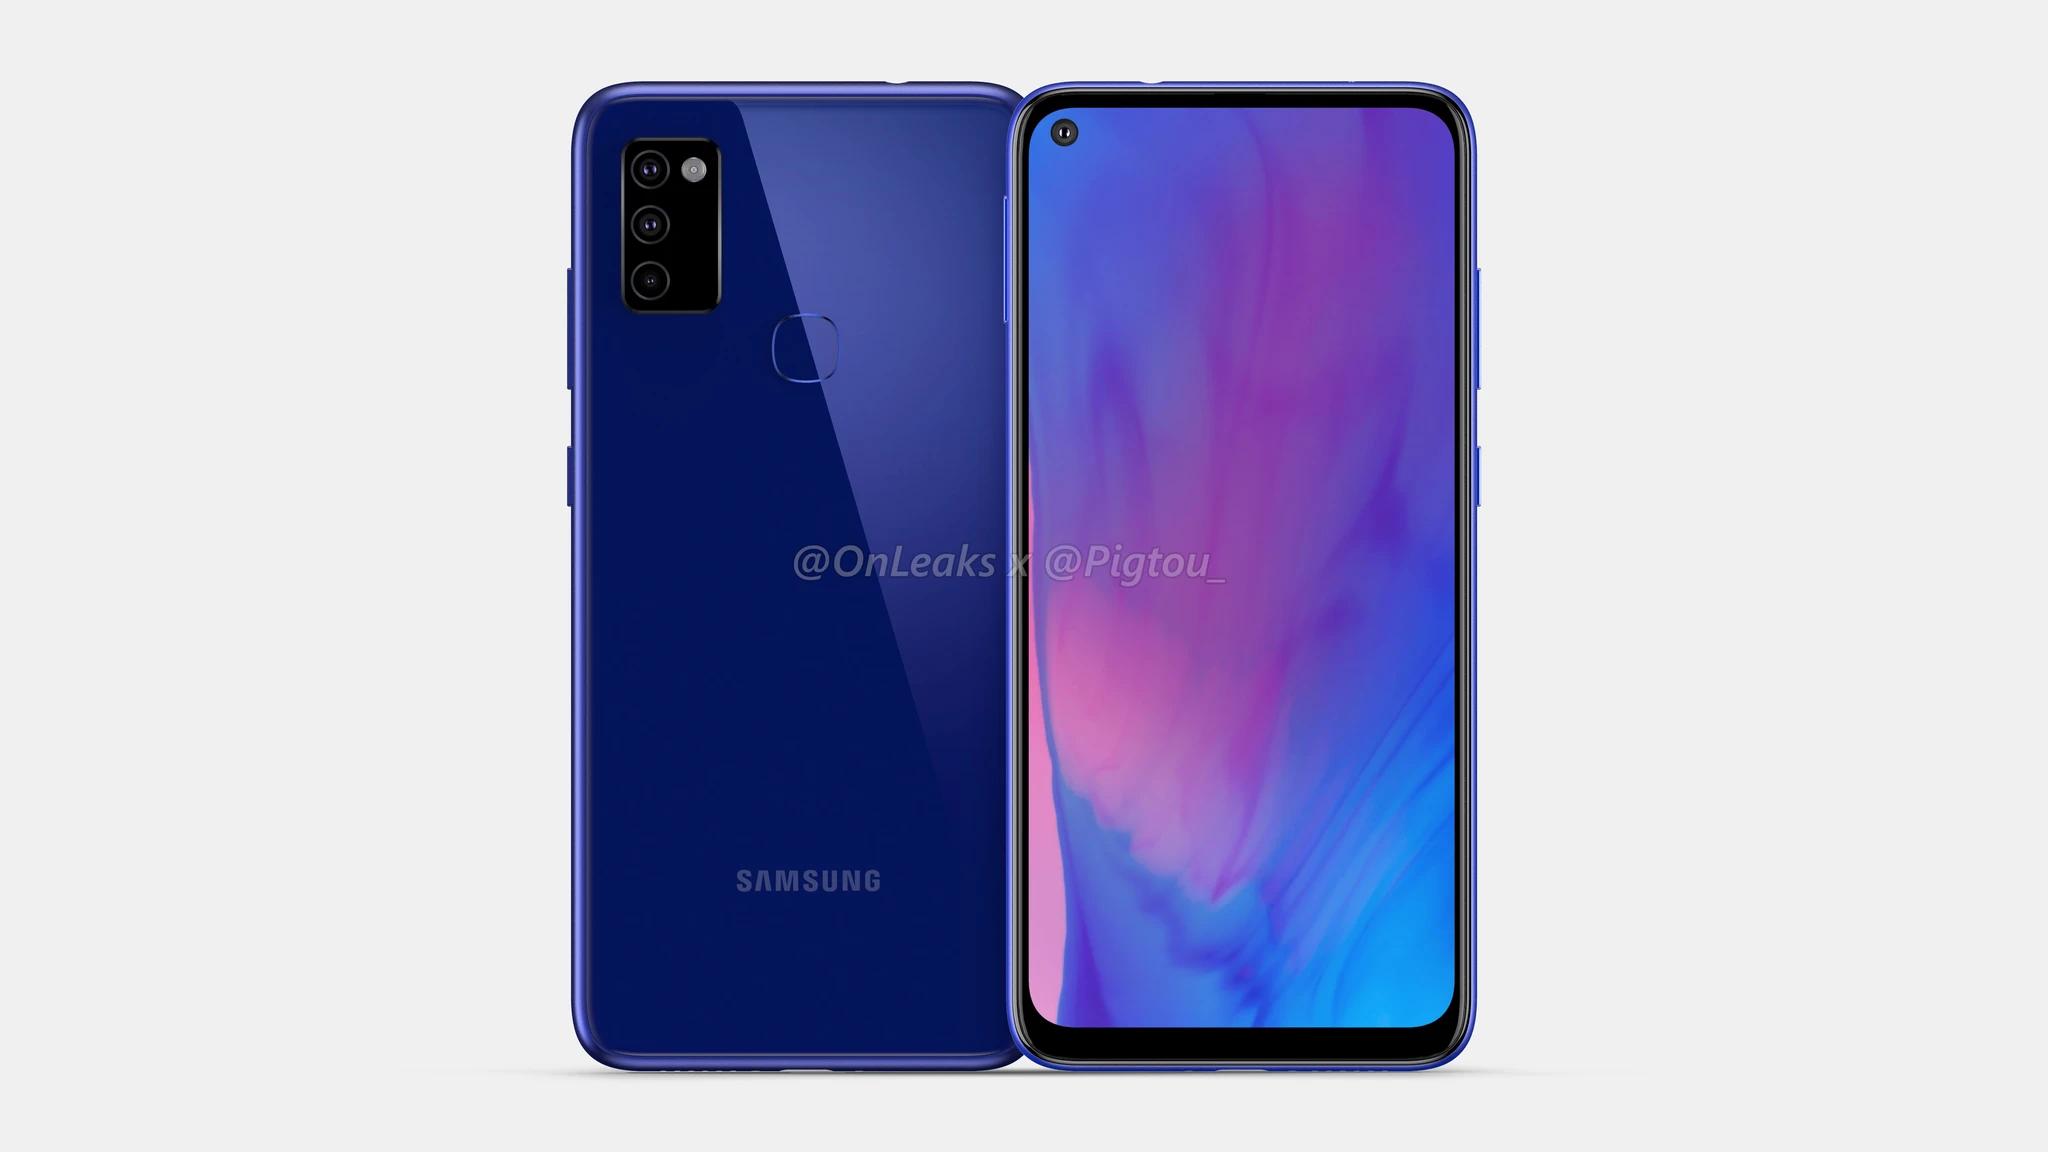 Samsung Galaxy M41 to pack massive 7,000mAH Battery Capacity